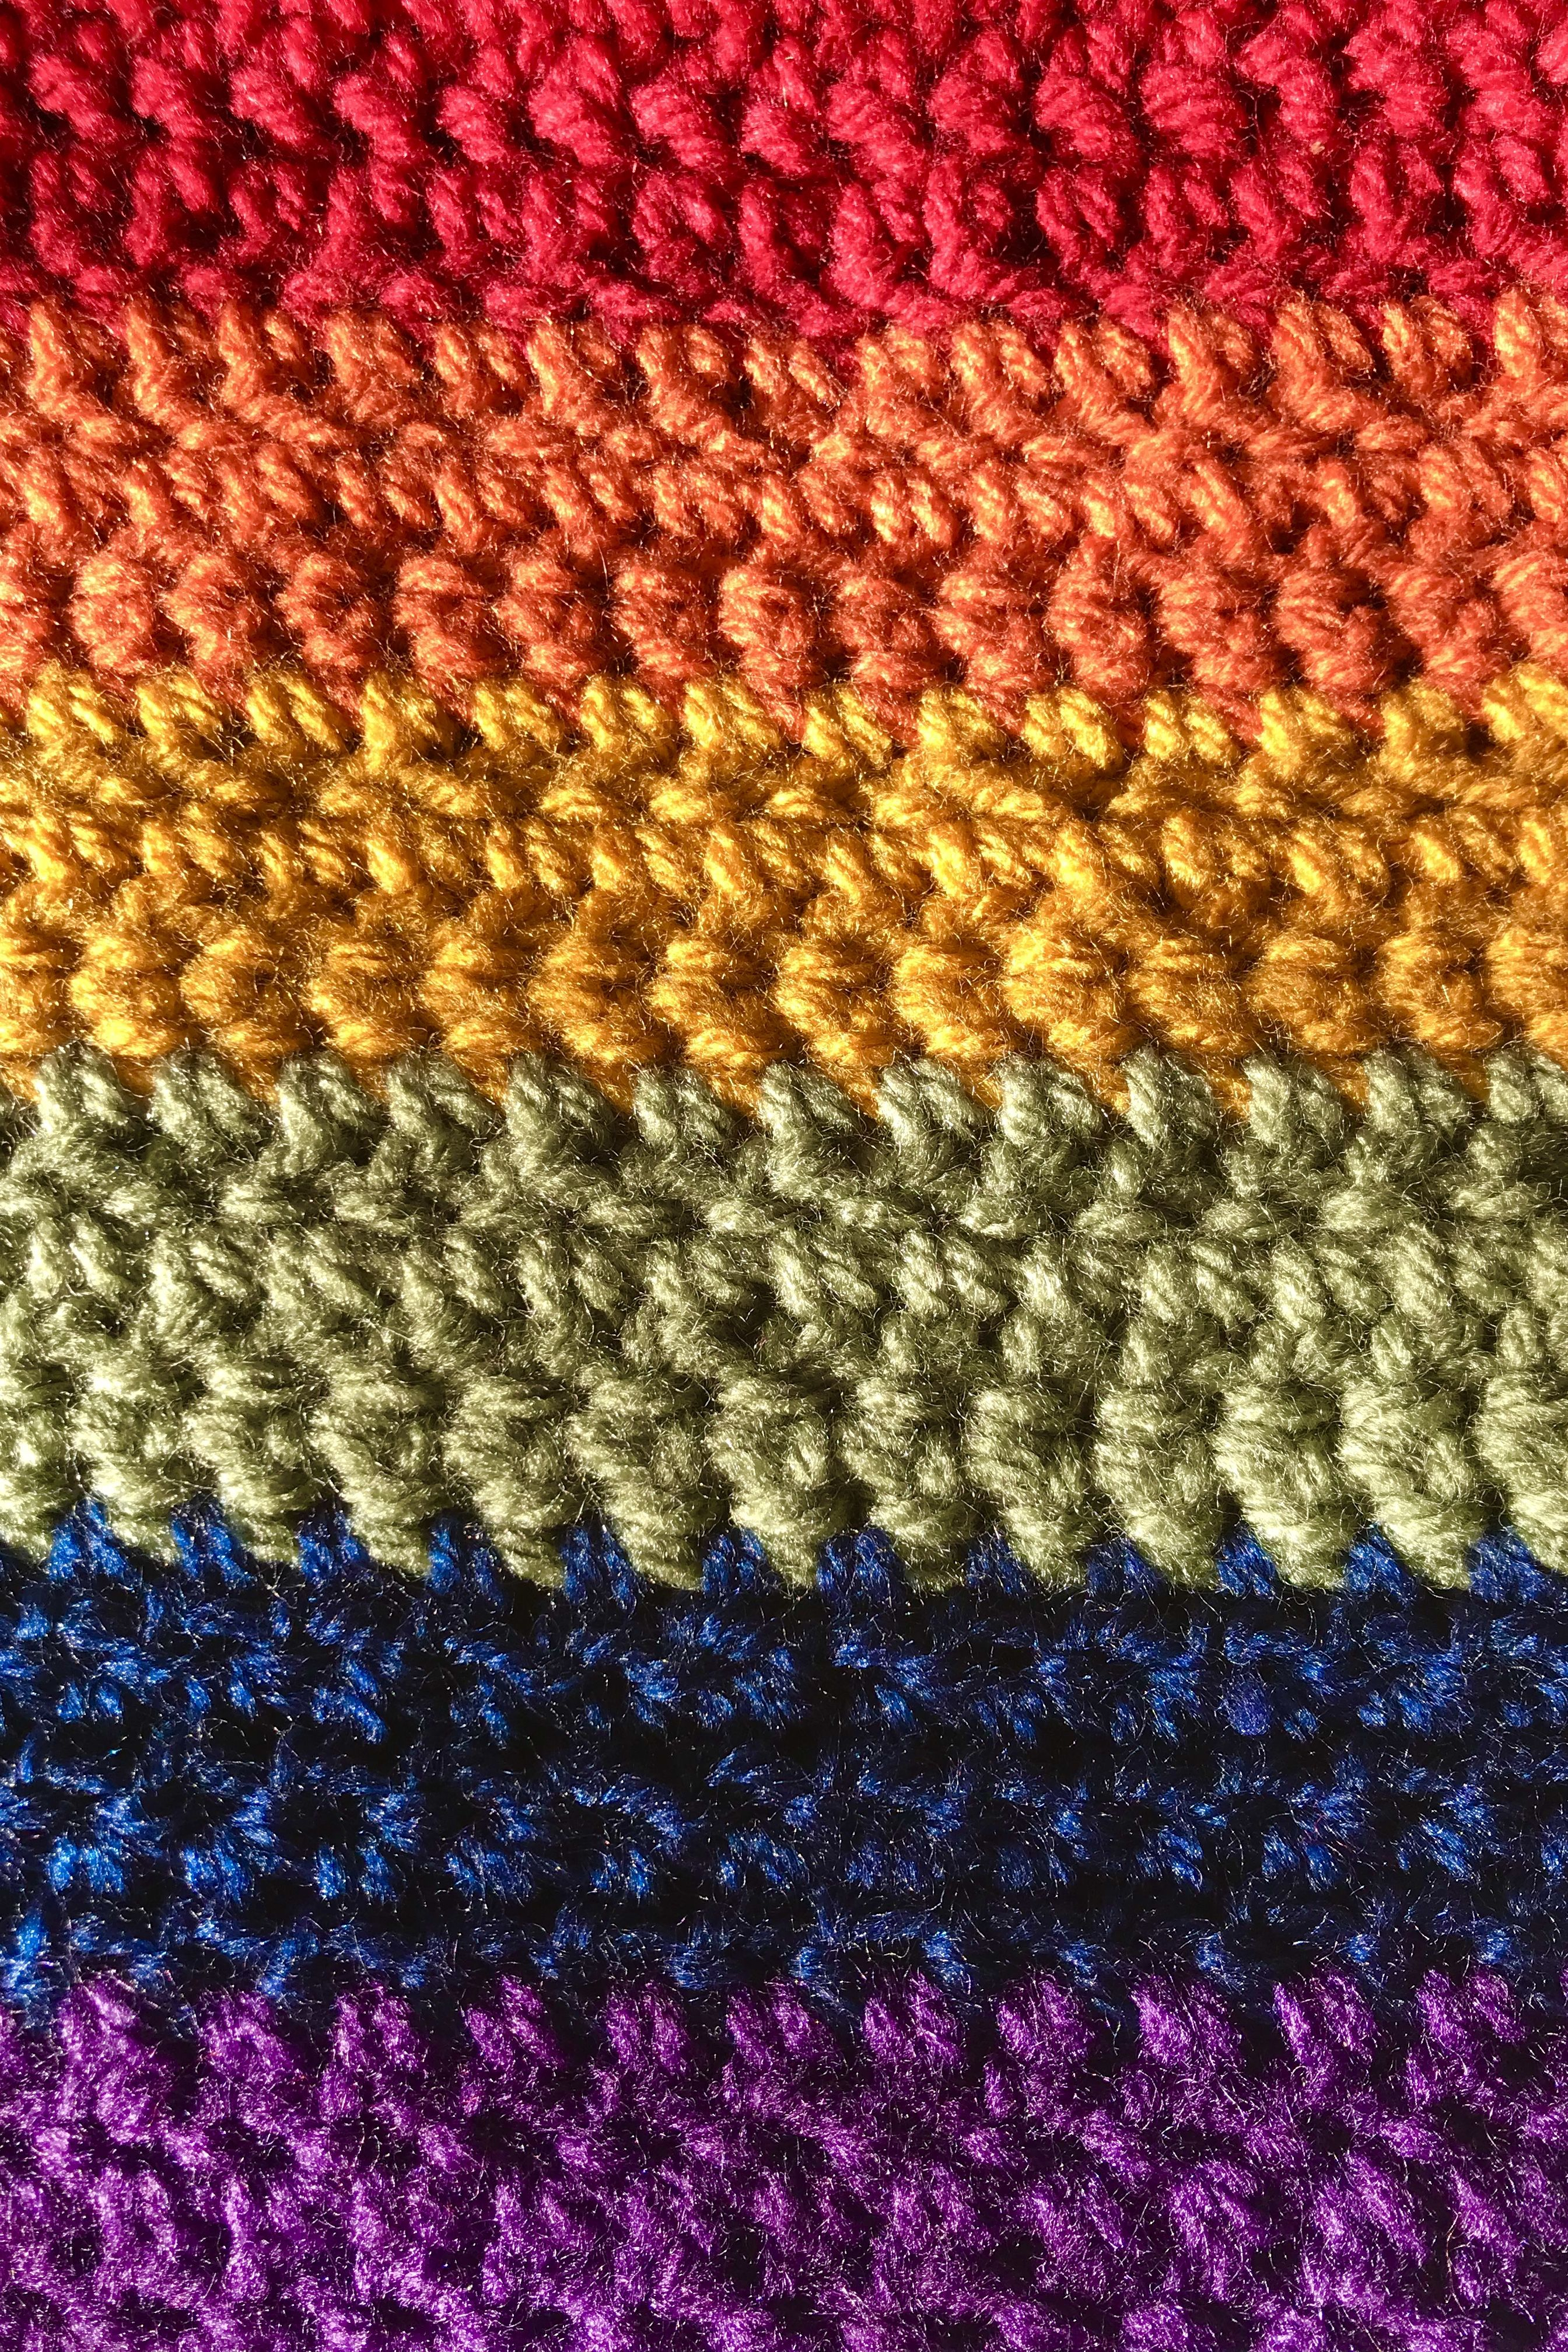 Crochet Rainbow Winter Iphone Background Wallpaper Iphone Background Wallpaper Winter Backgrounds Iphone Crochet Art